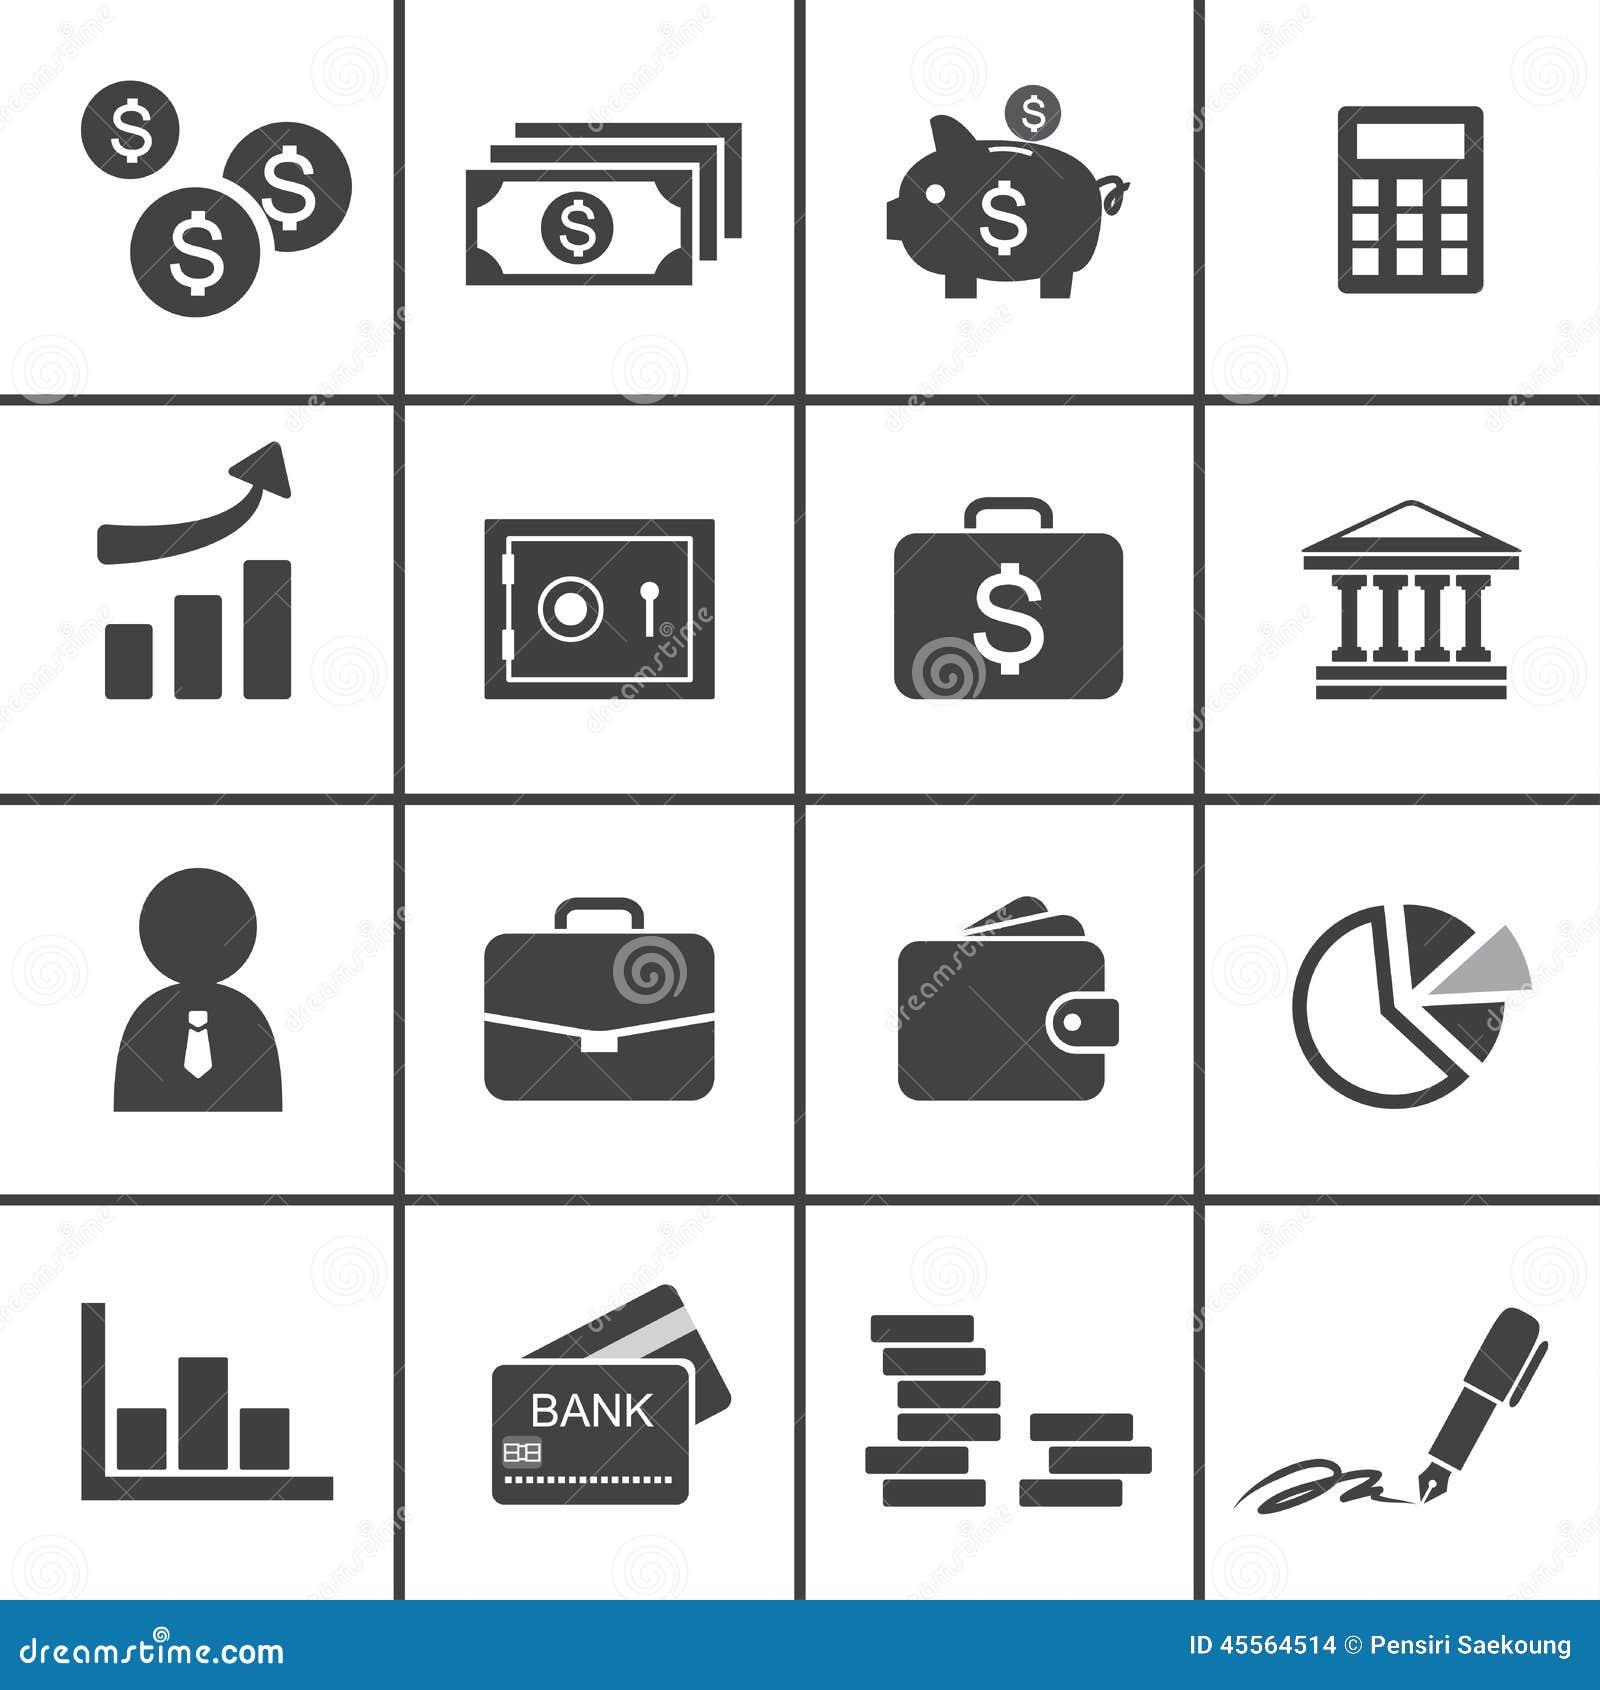 Money finance banking icons stock vector illustration 45564514 money finance banking icons biocorpaavc